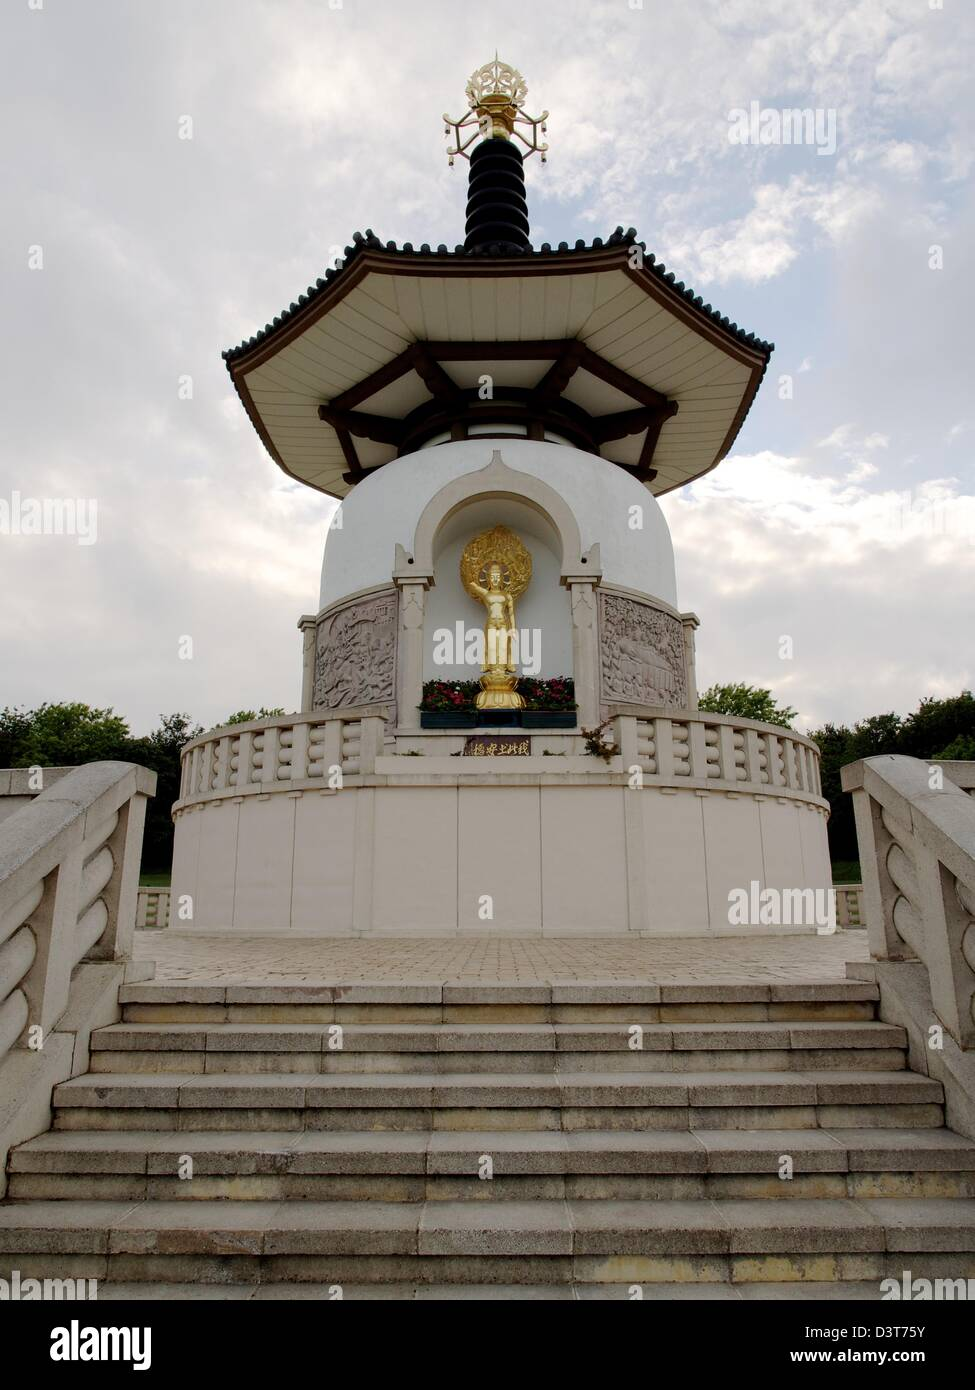 The Peace Pagoda at Milton Keynes Willen Lake - Stock Image